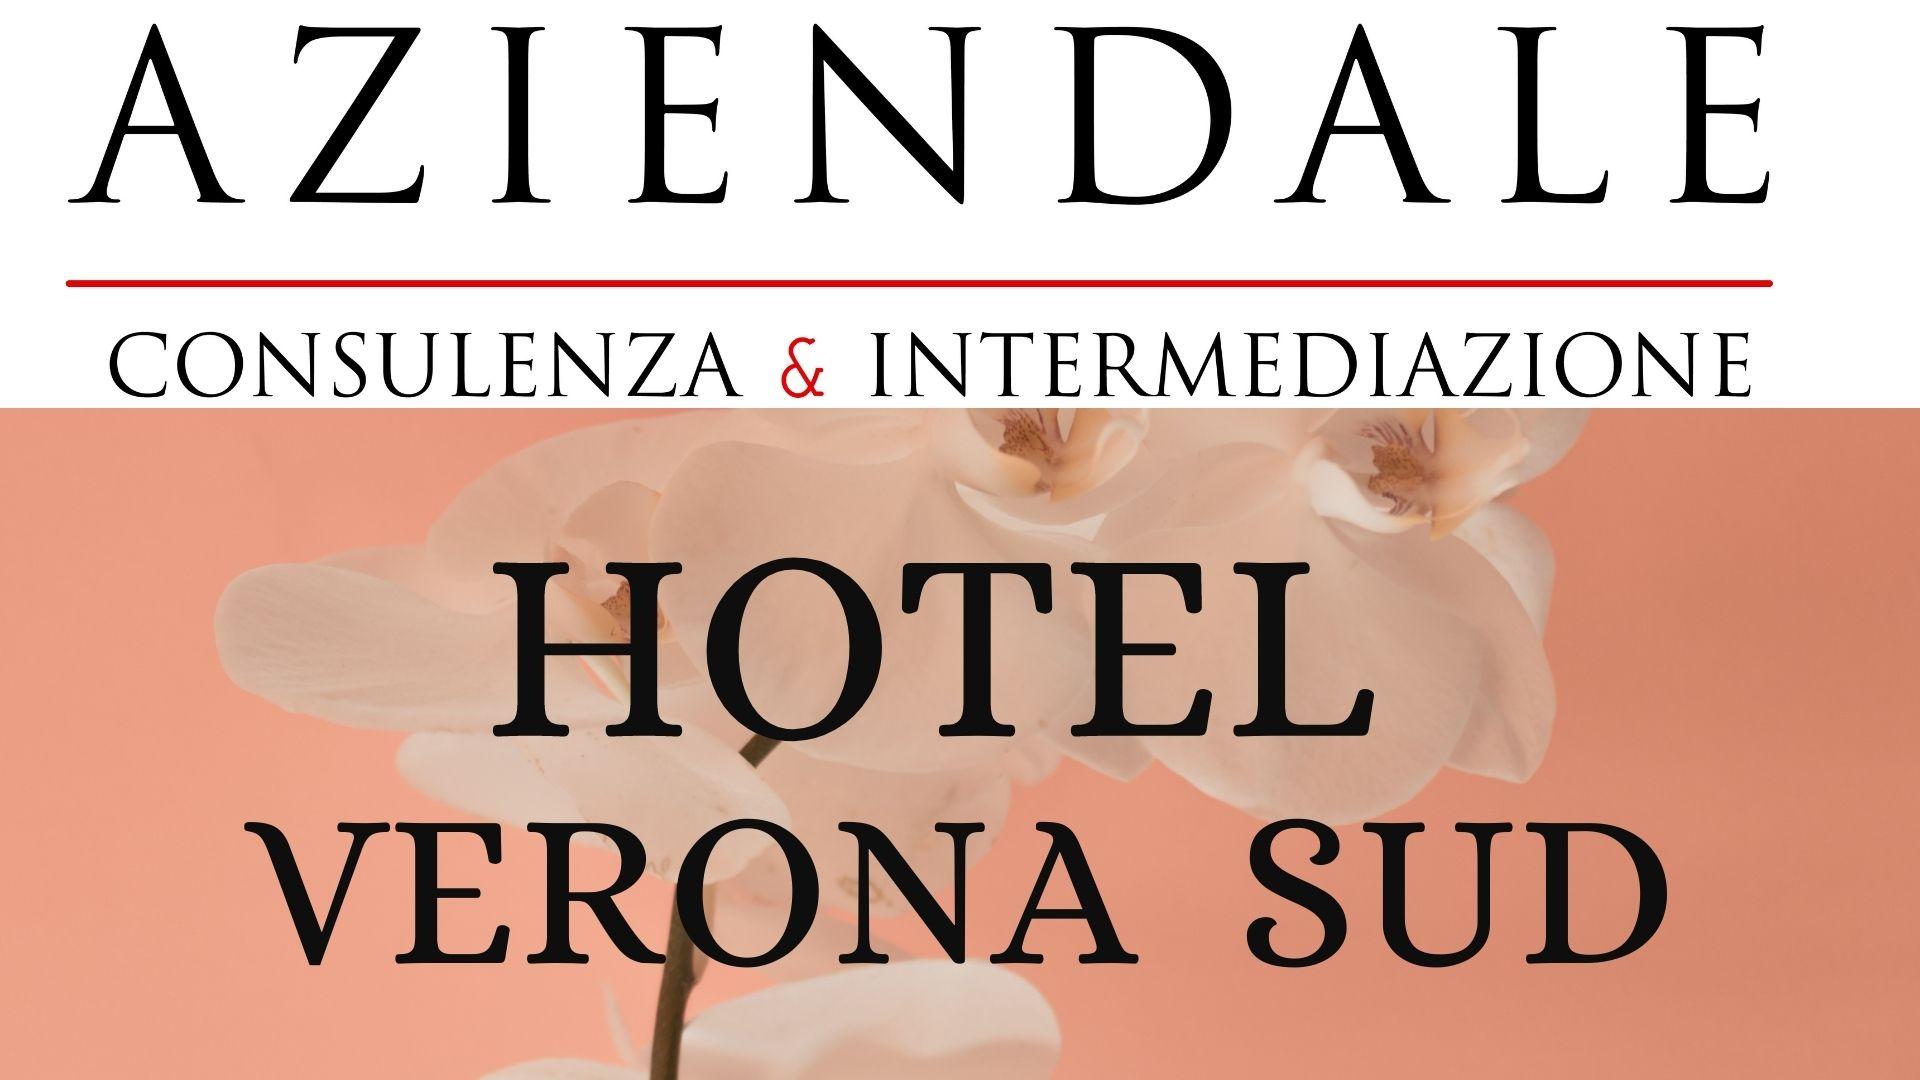 HOTEL ZONA VERONA SUD